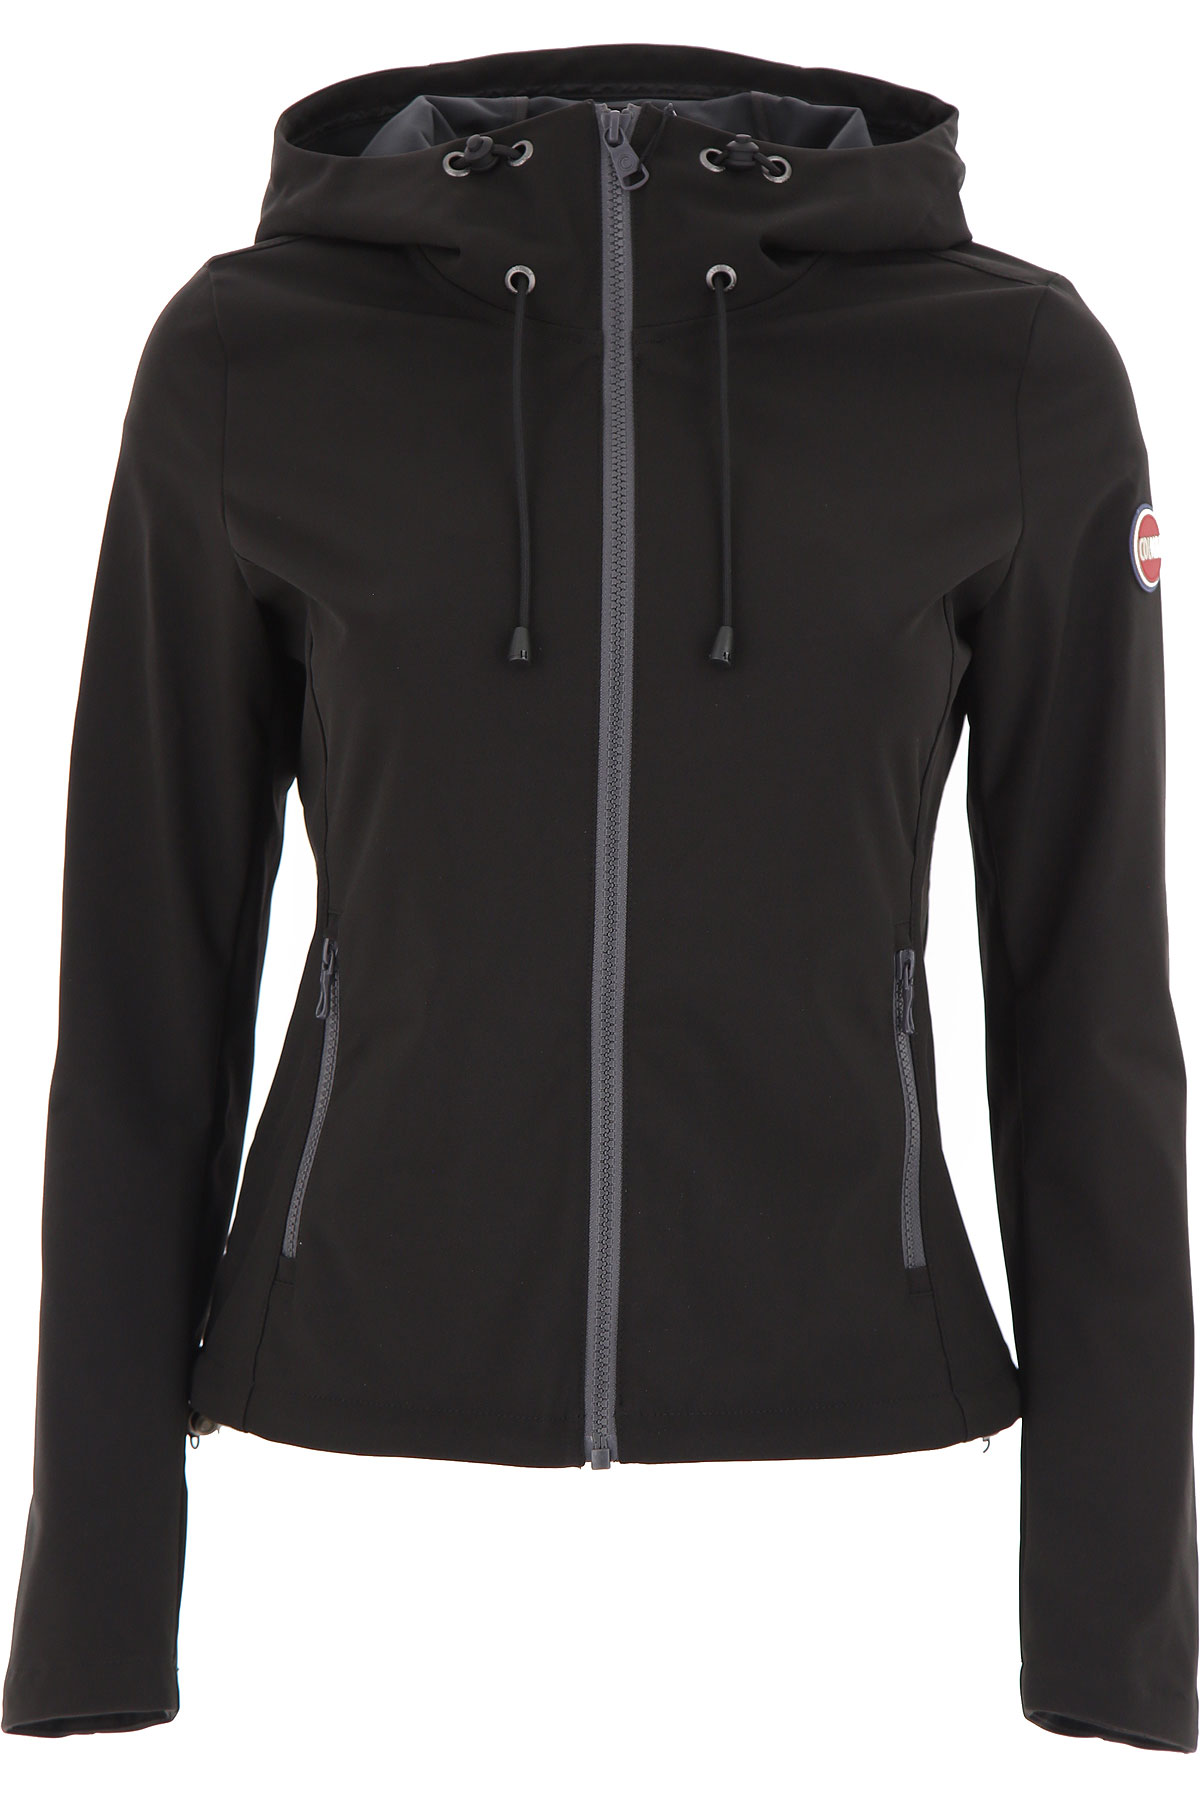 Colmar Jacket for Women On Sale, Black, polyester, 2019, 2 4 6 8